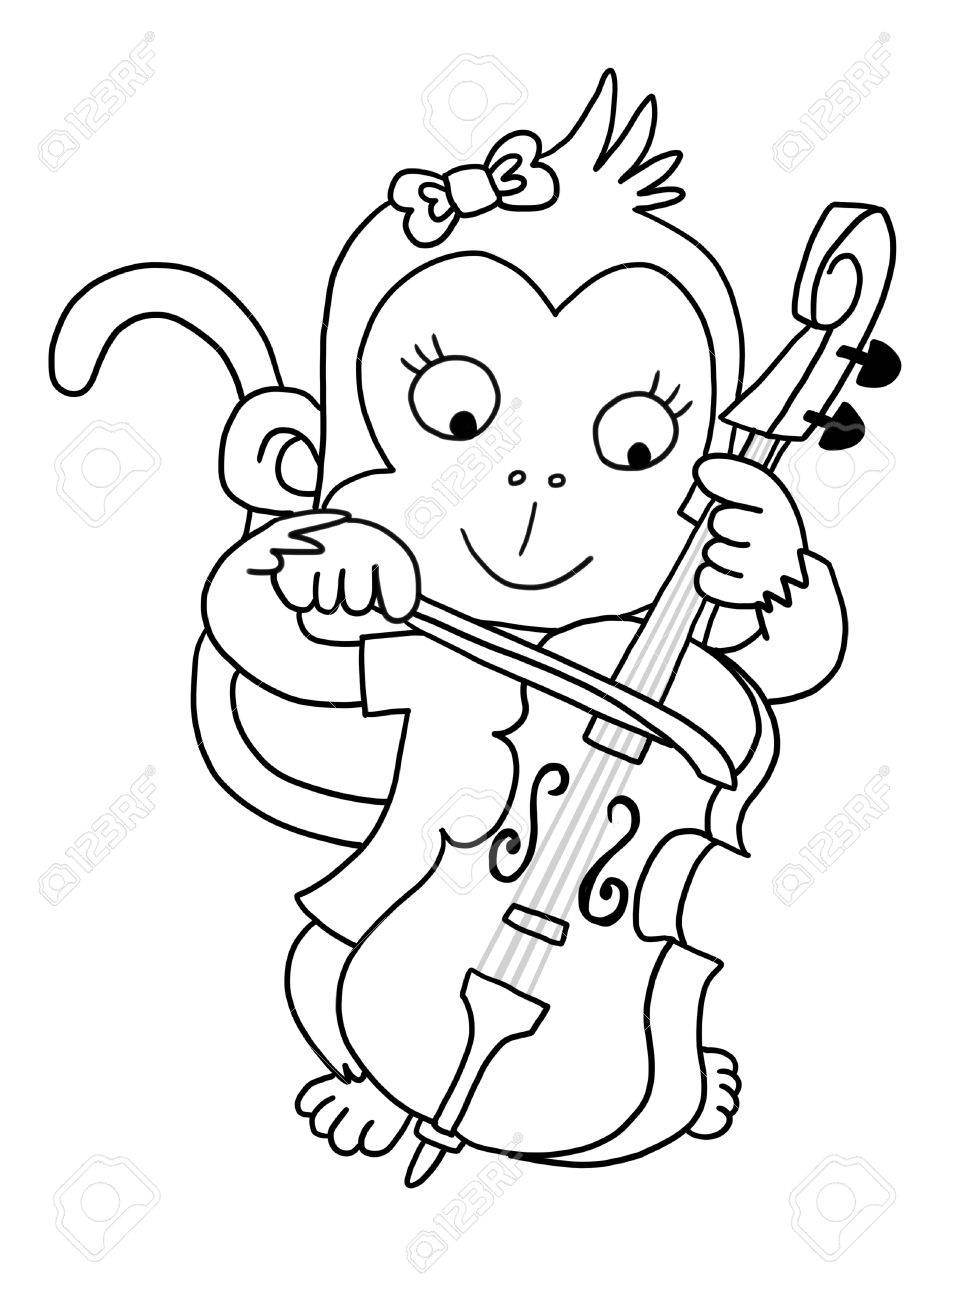 Cello coloring page